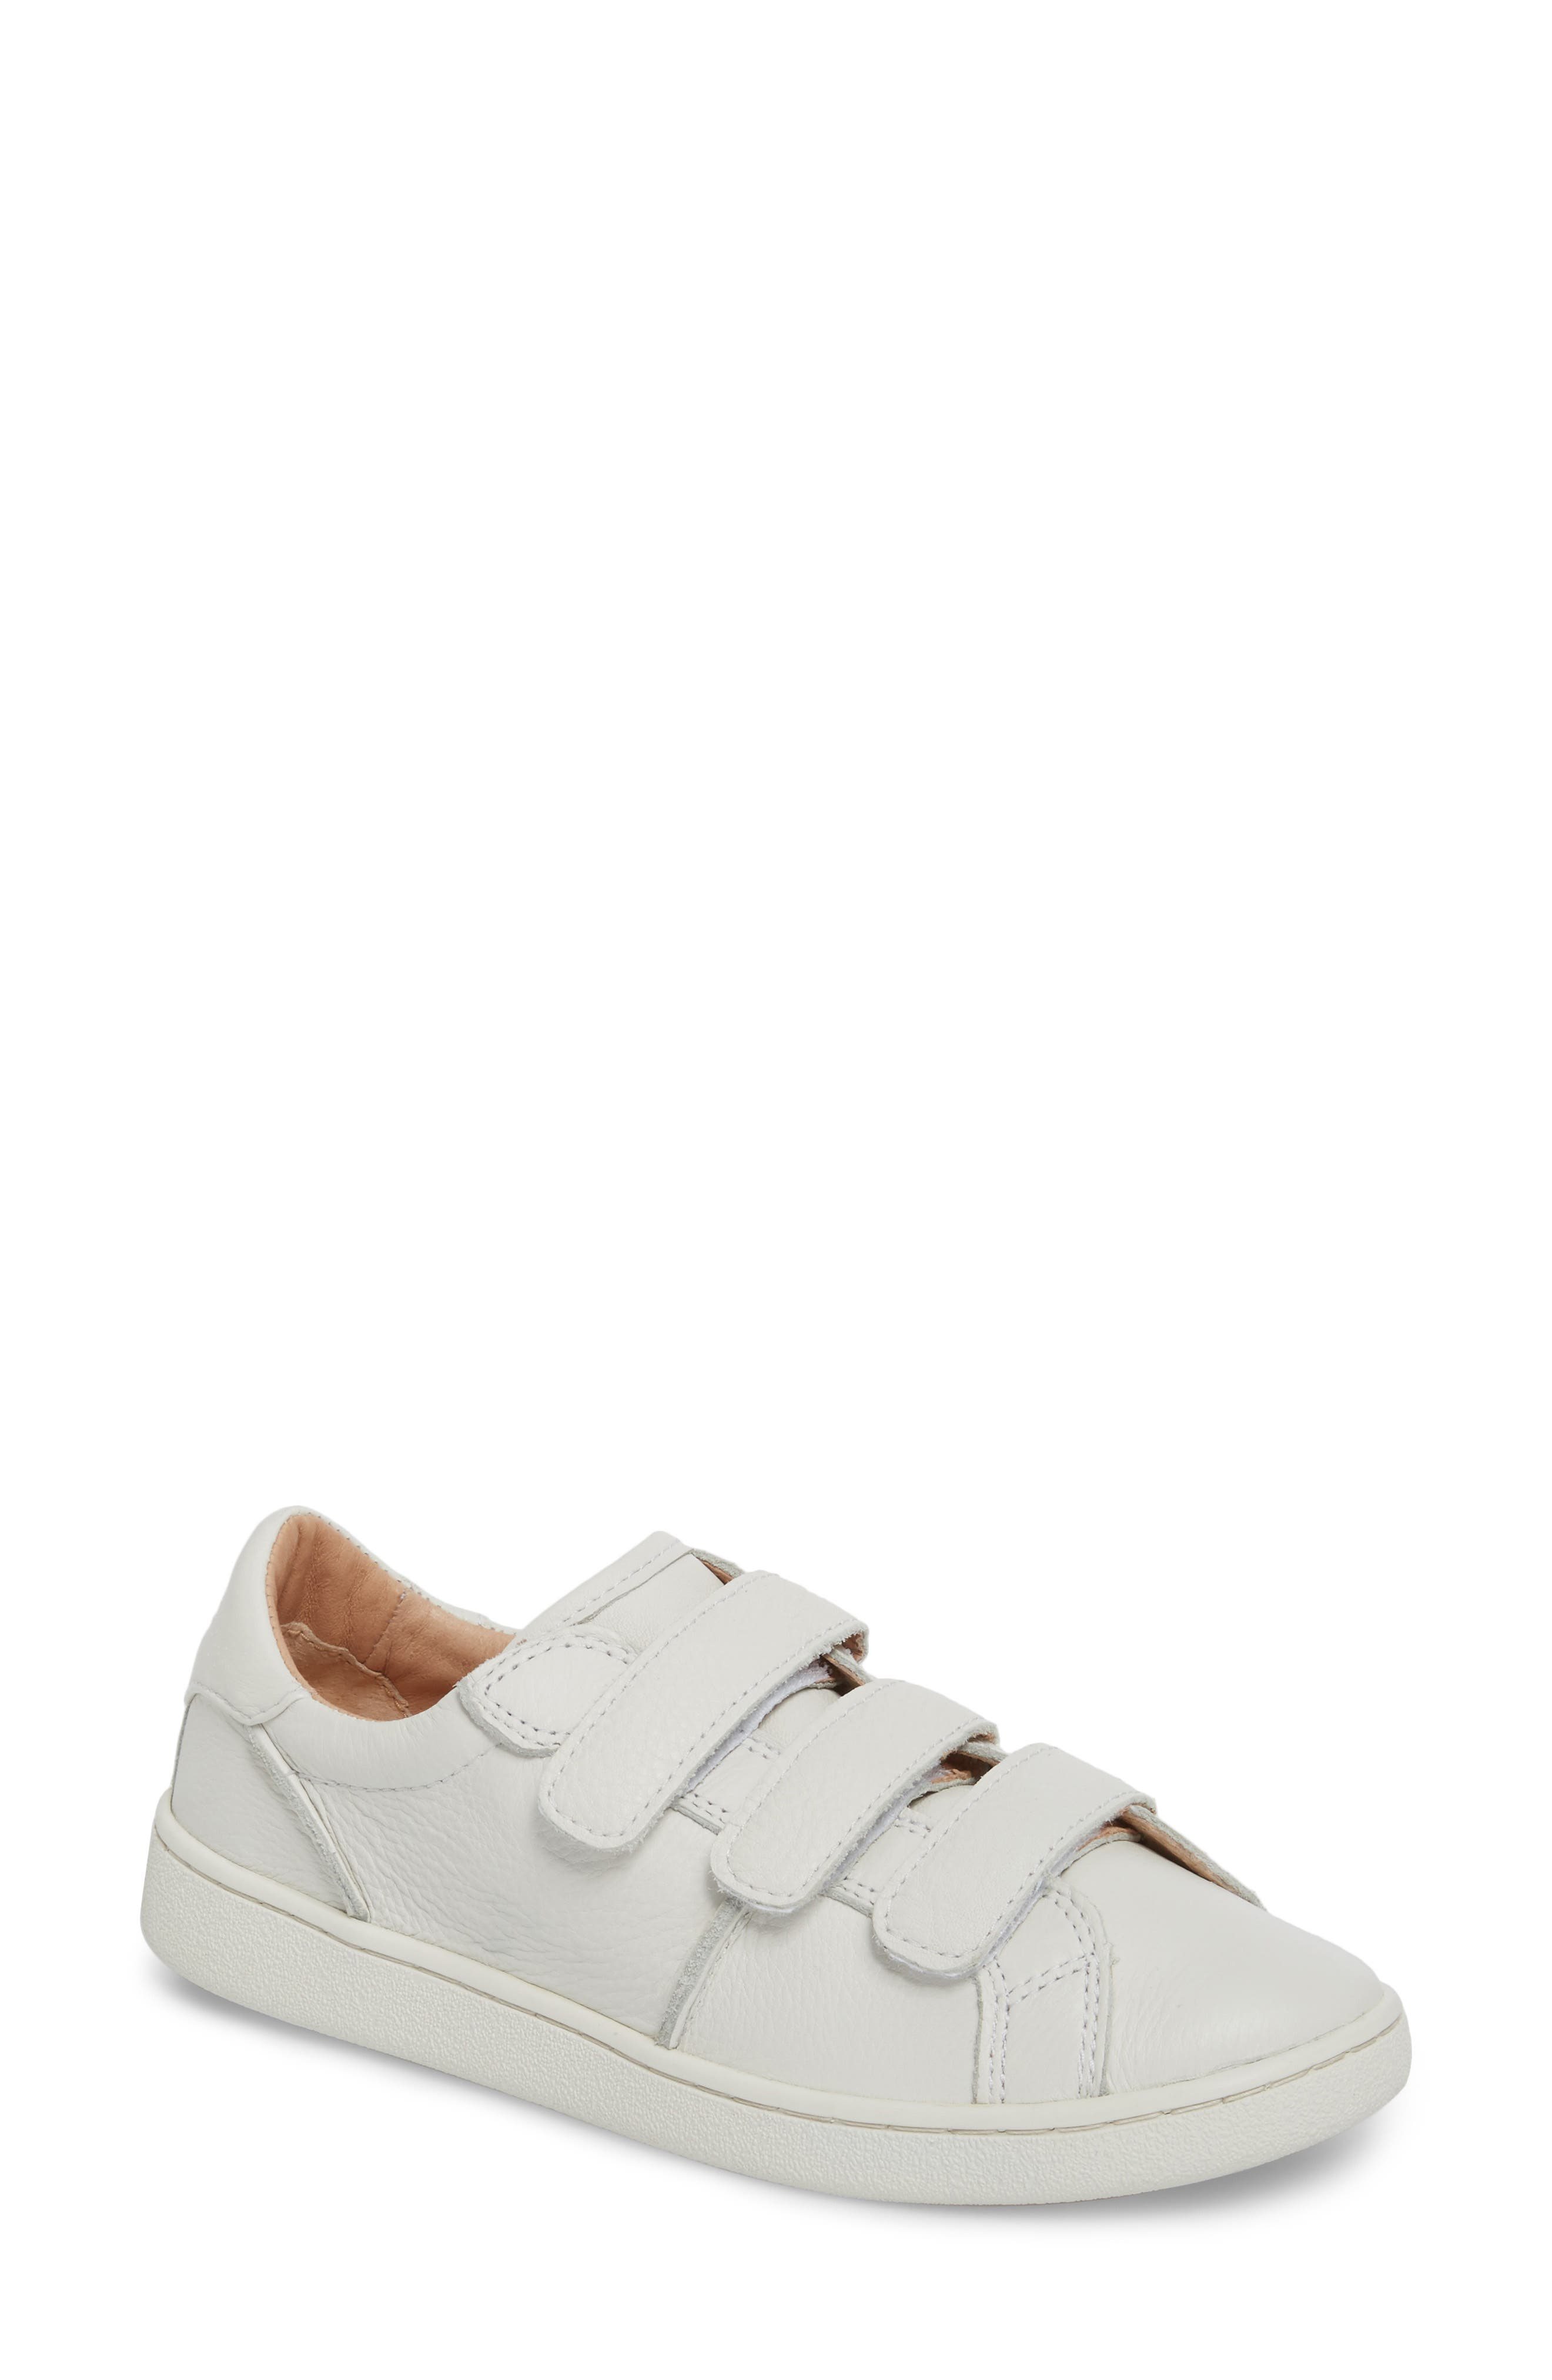 Alix Sneaker,                         Main,                         color, WHITE LEATHER